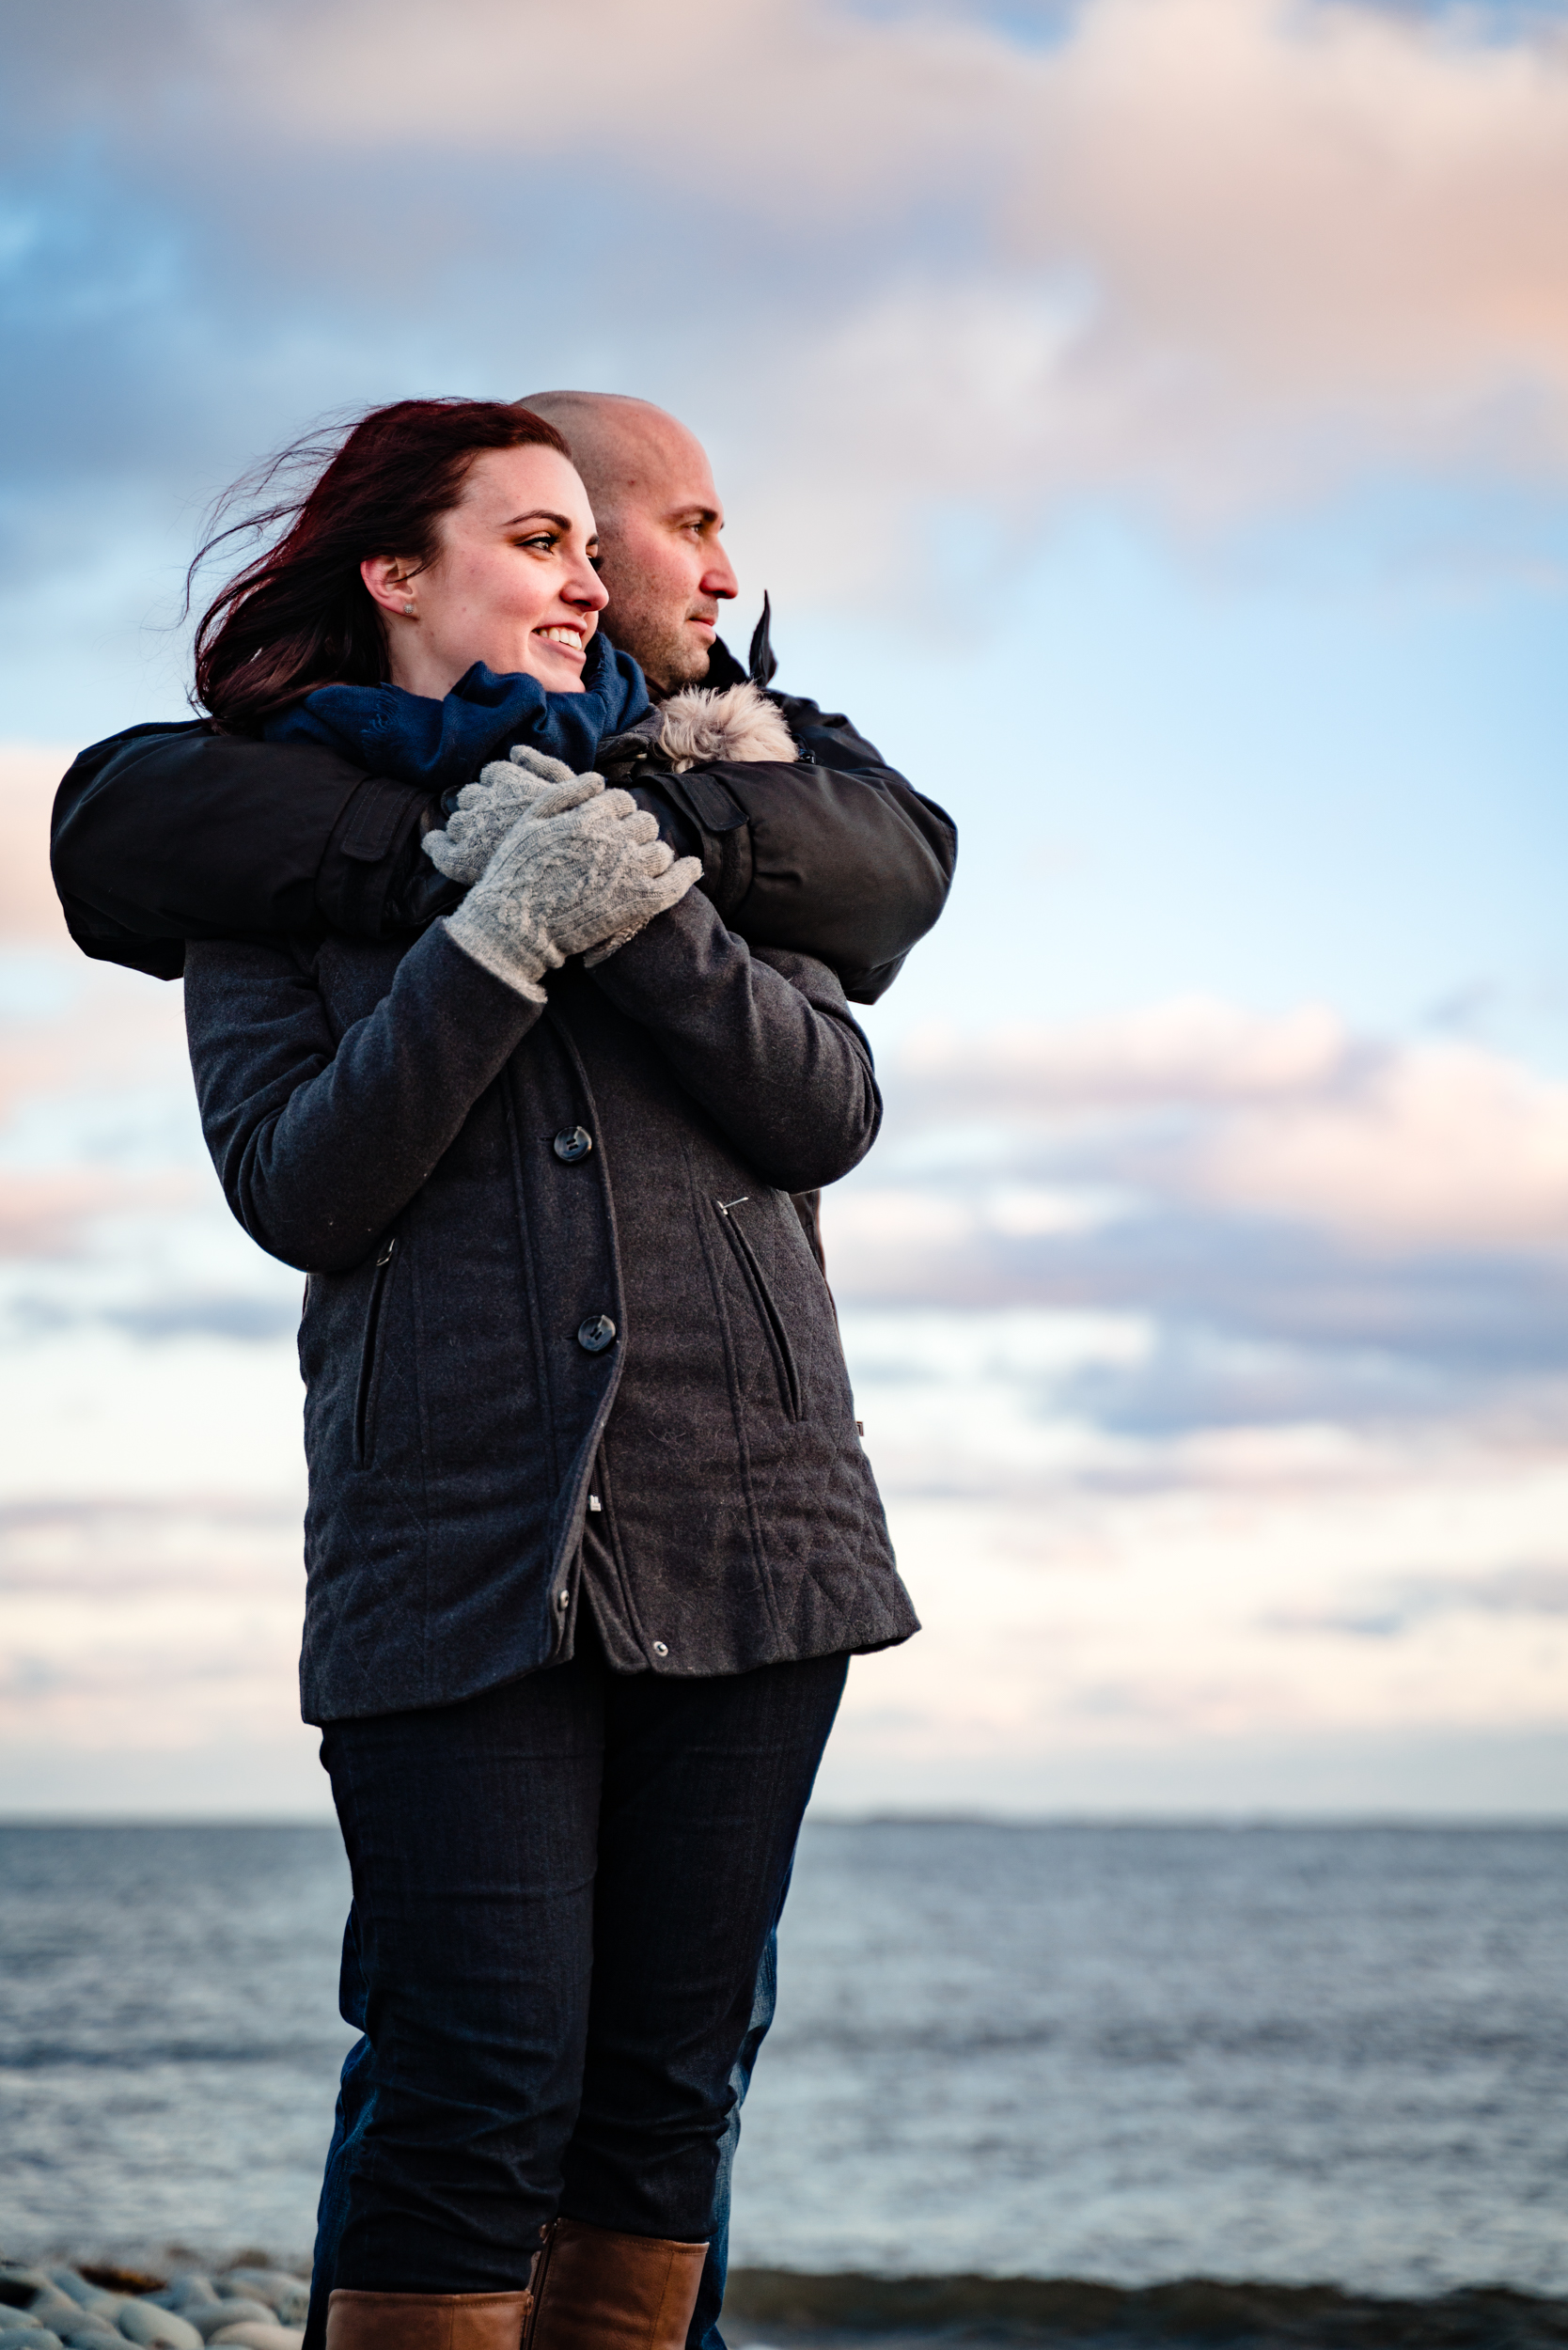 Sarah&Shayne-Halifax-engagement-weddingphotography-weddingphotographers-novascotia (29 of 41).jpg